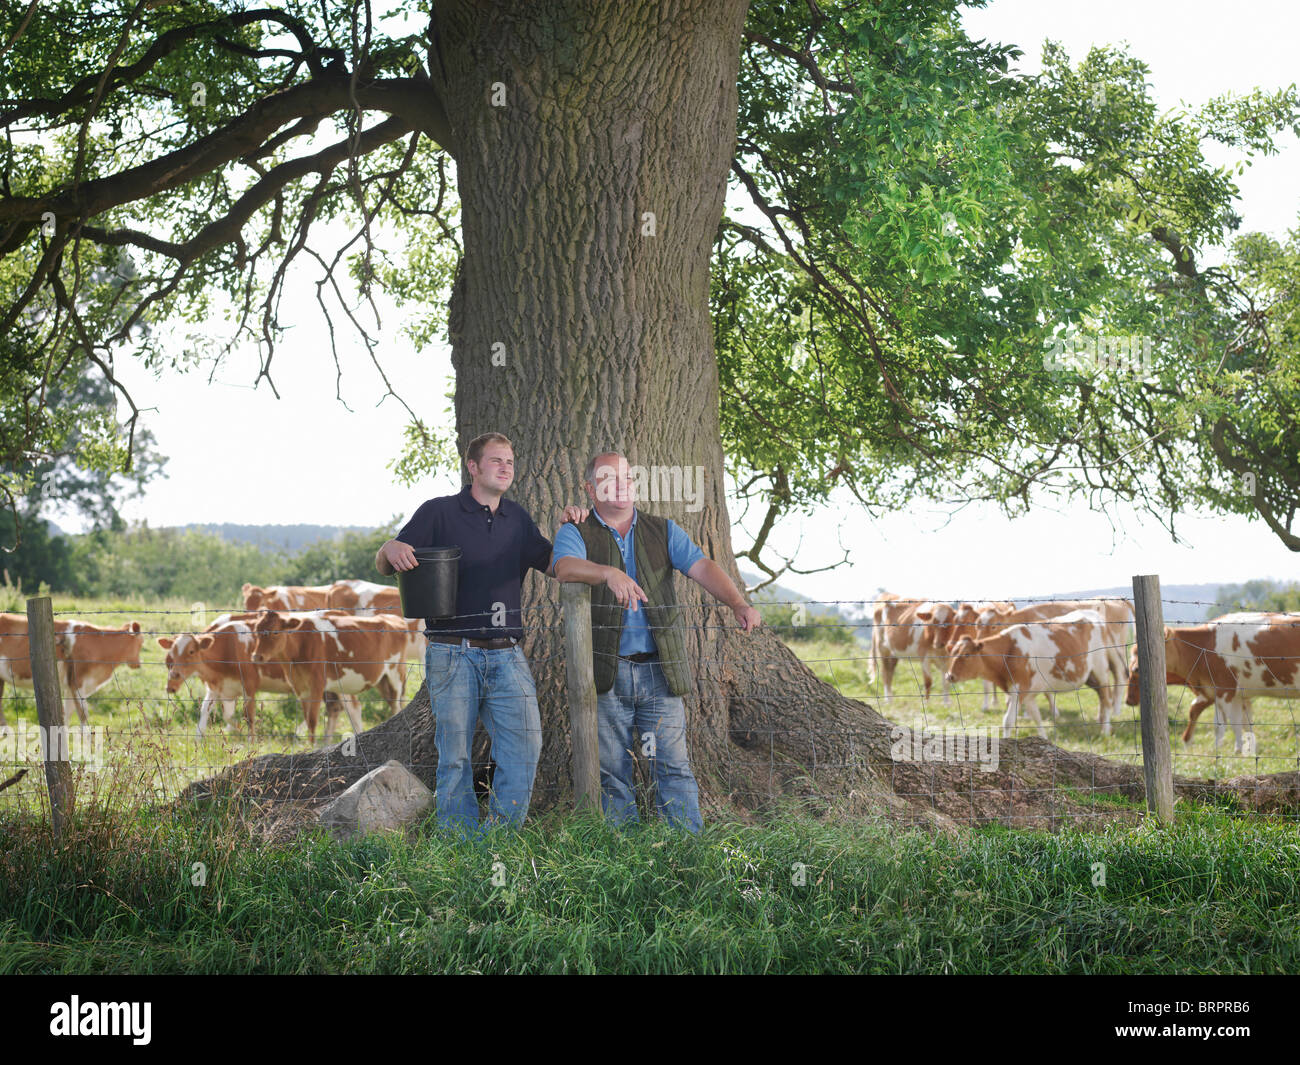 Farmer and son with Guernsey calves - Stock Image